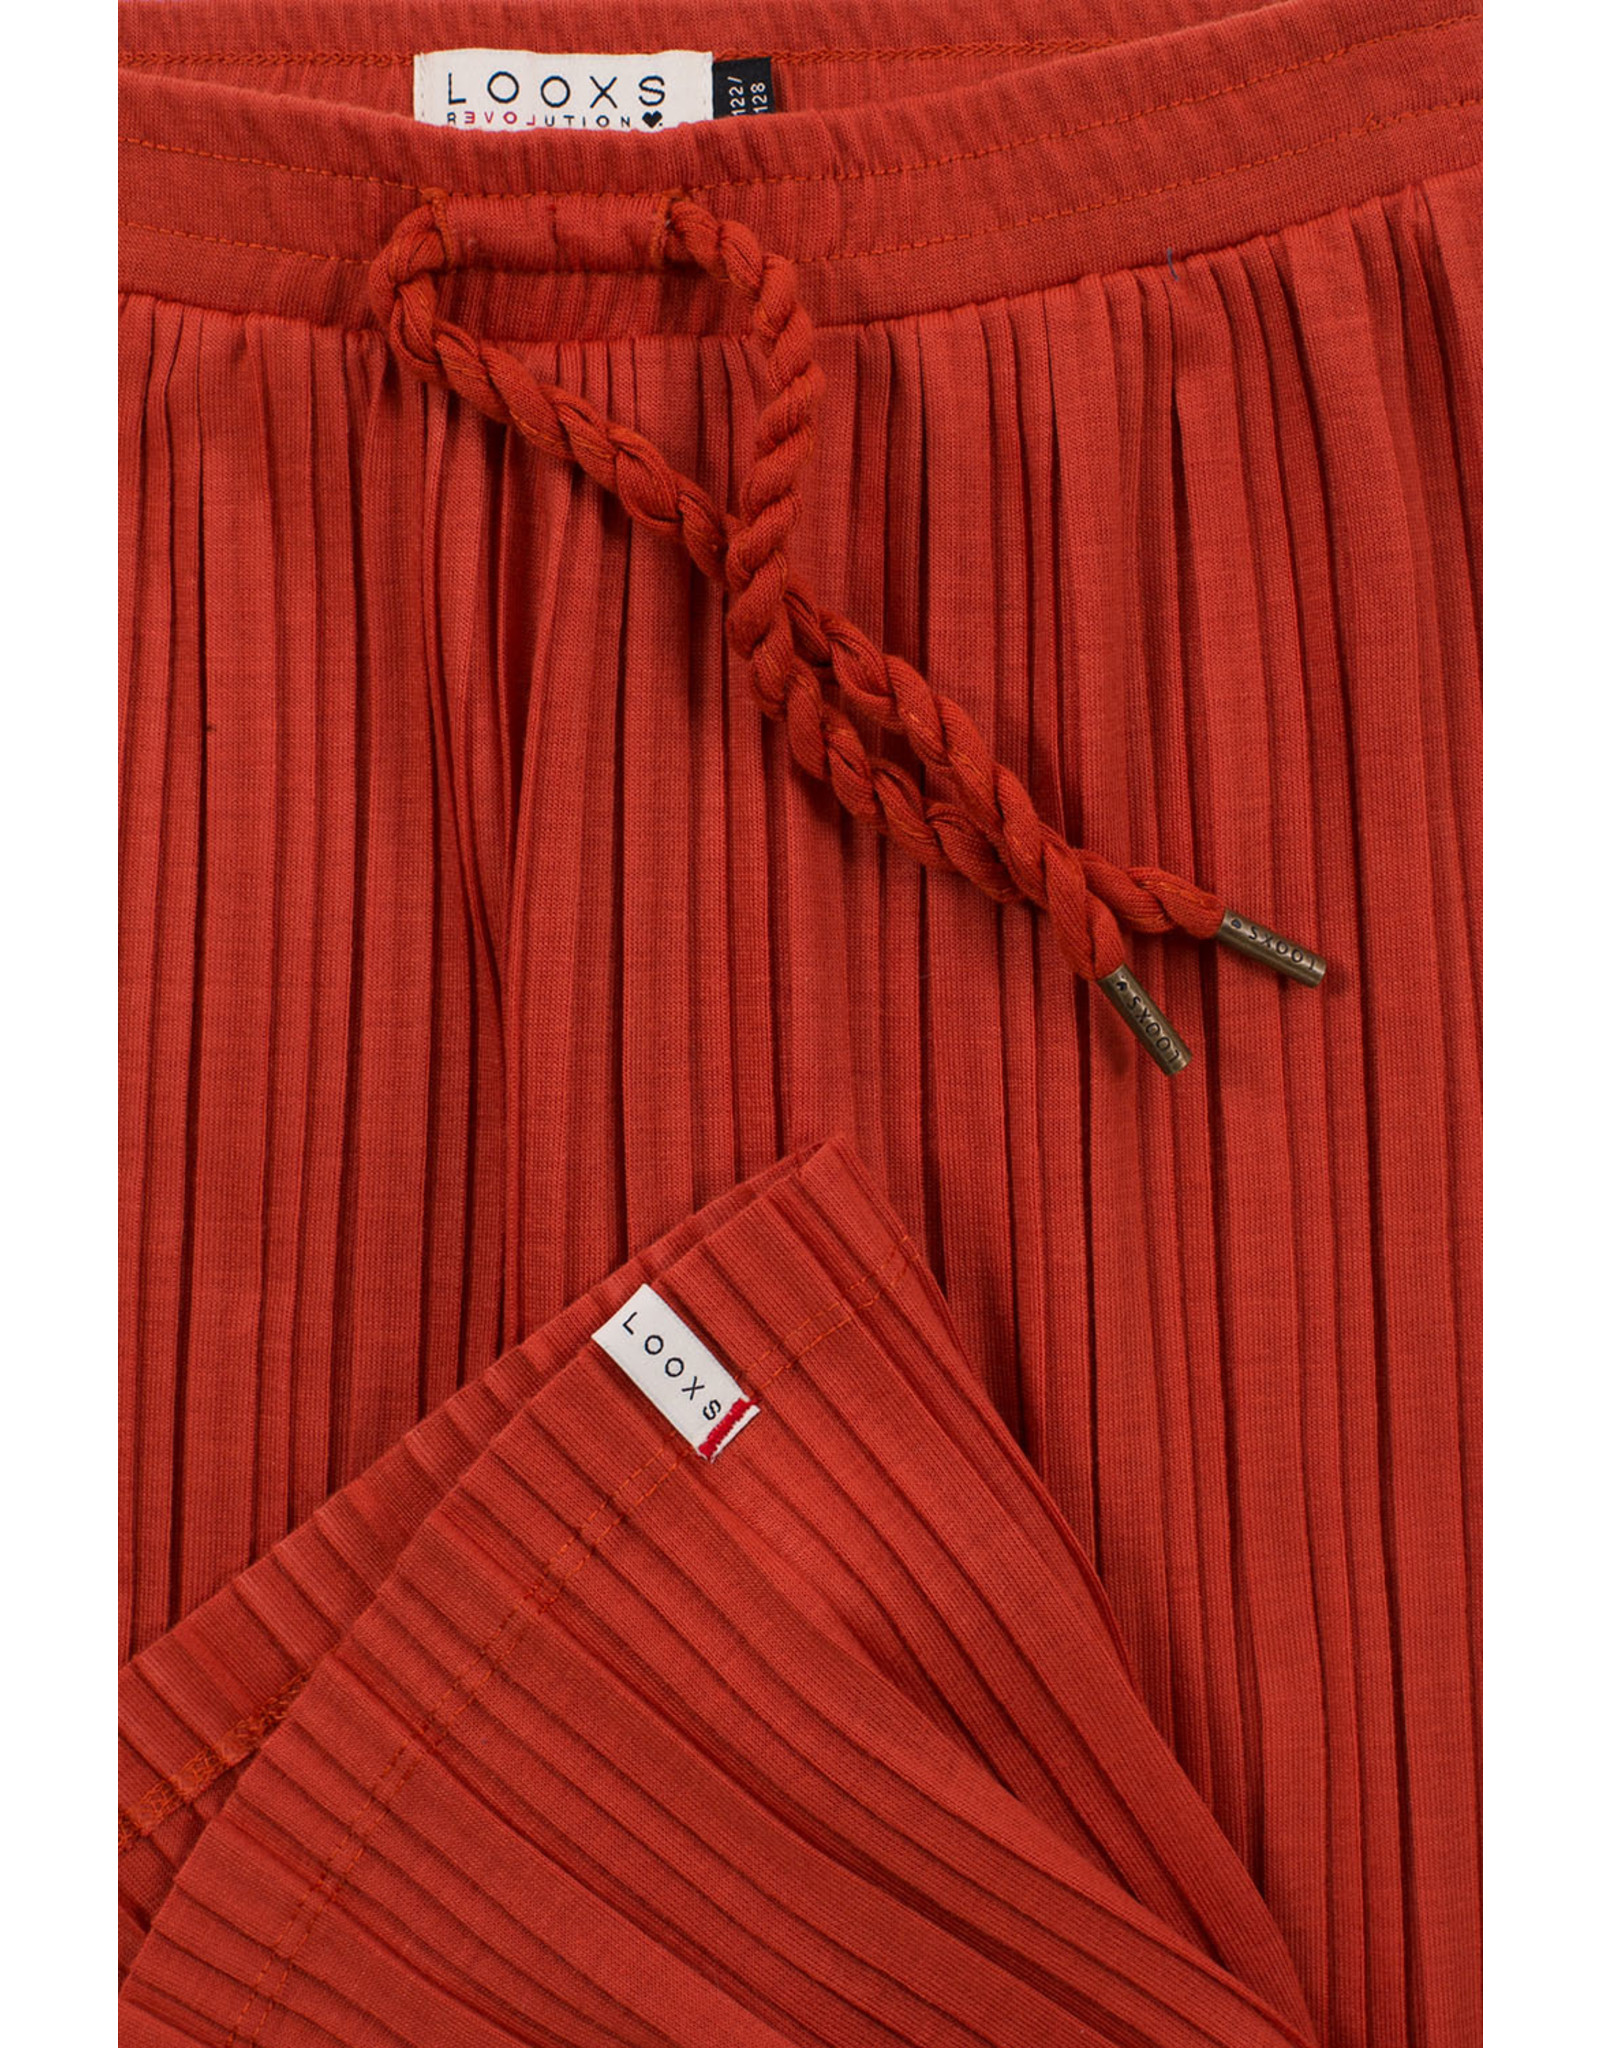 Looxs 10SIXTEEN Wide pants maat 164